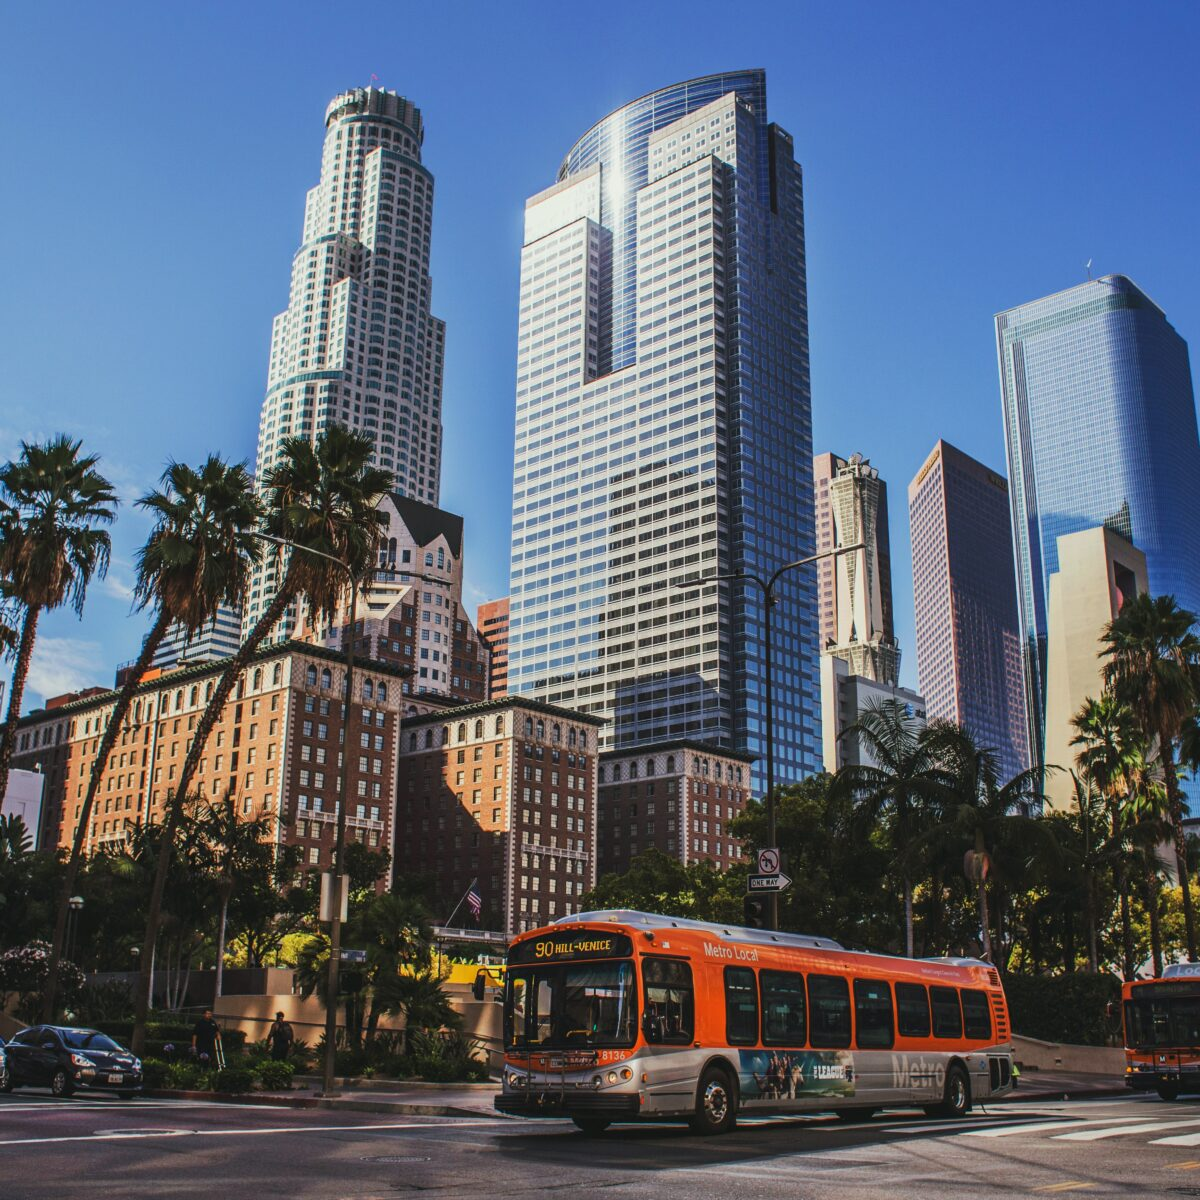 Los Angeles Streets (